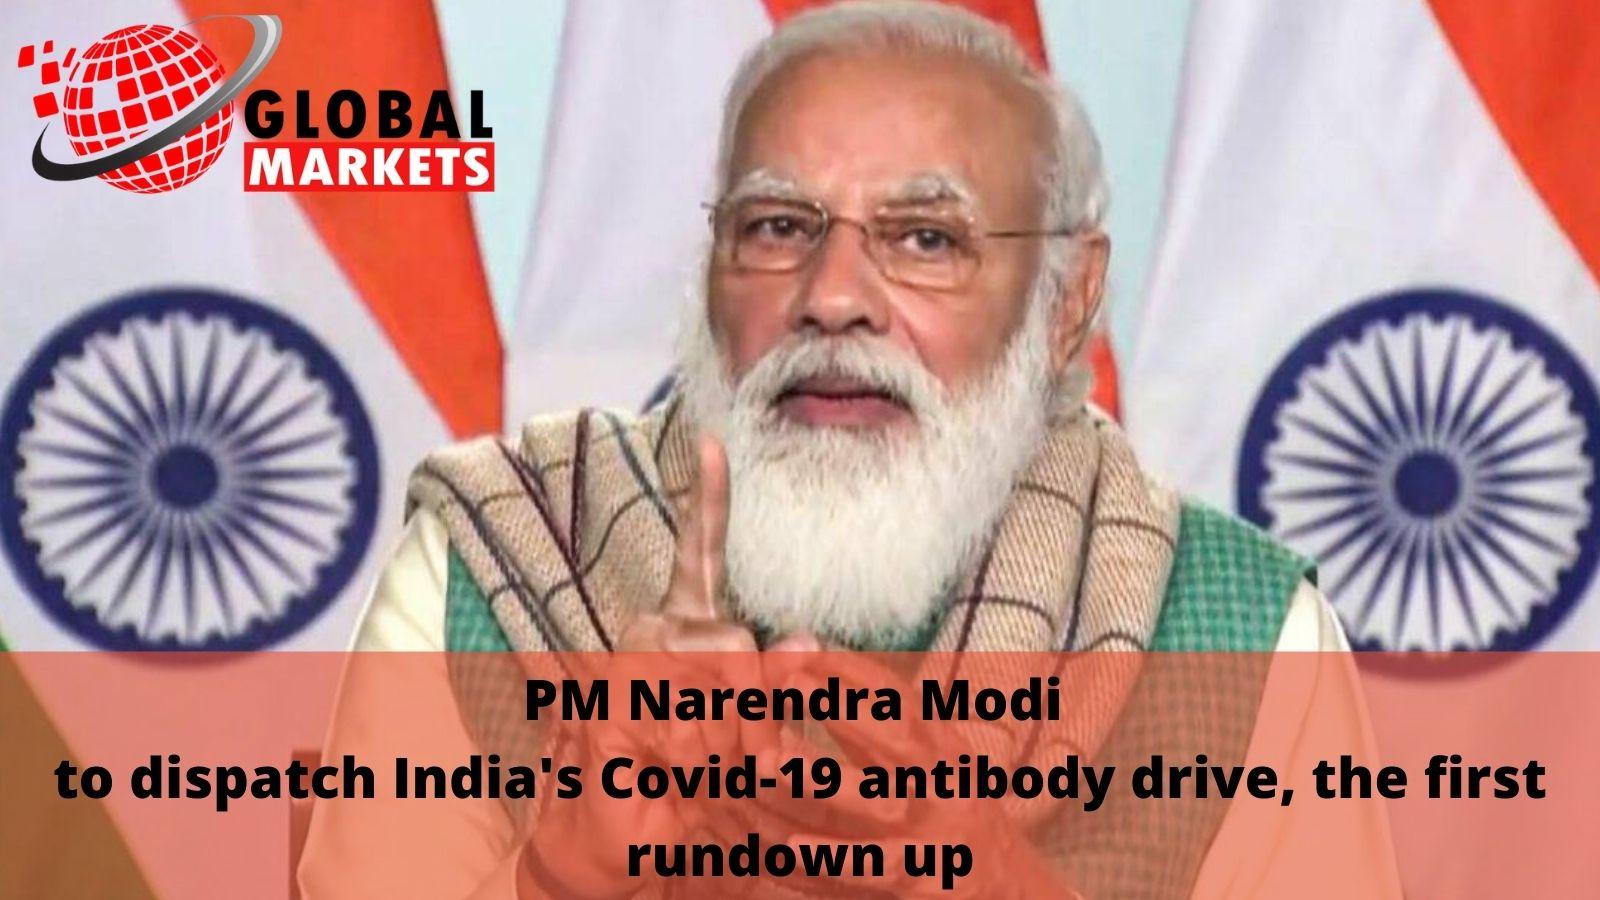 PM Narendra Modi to dispatch India's Covid-19 antibody drive, the first rundown up